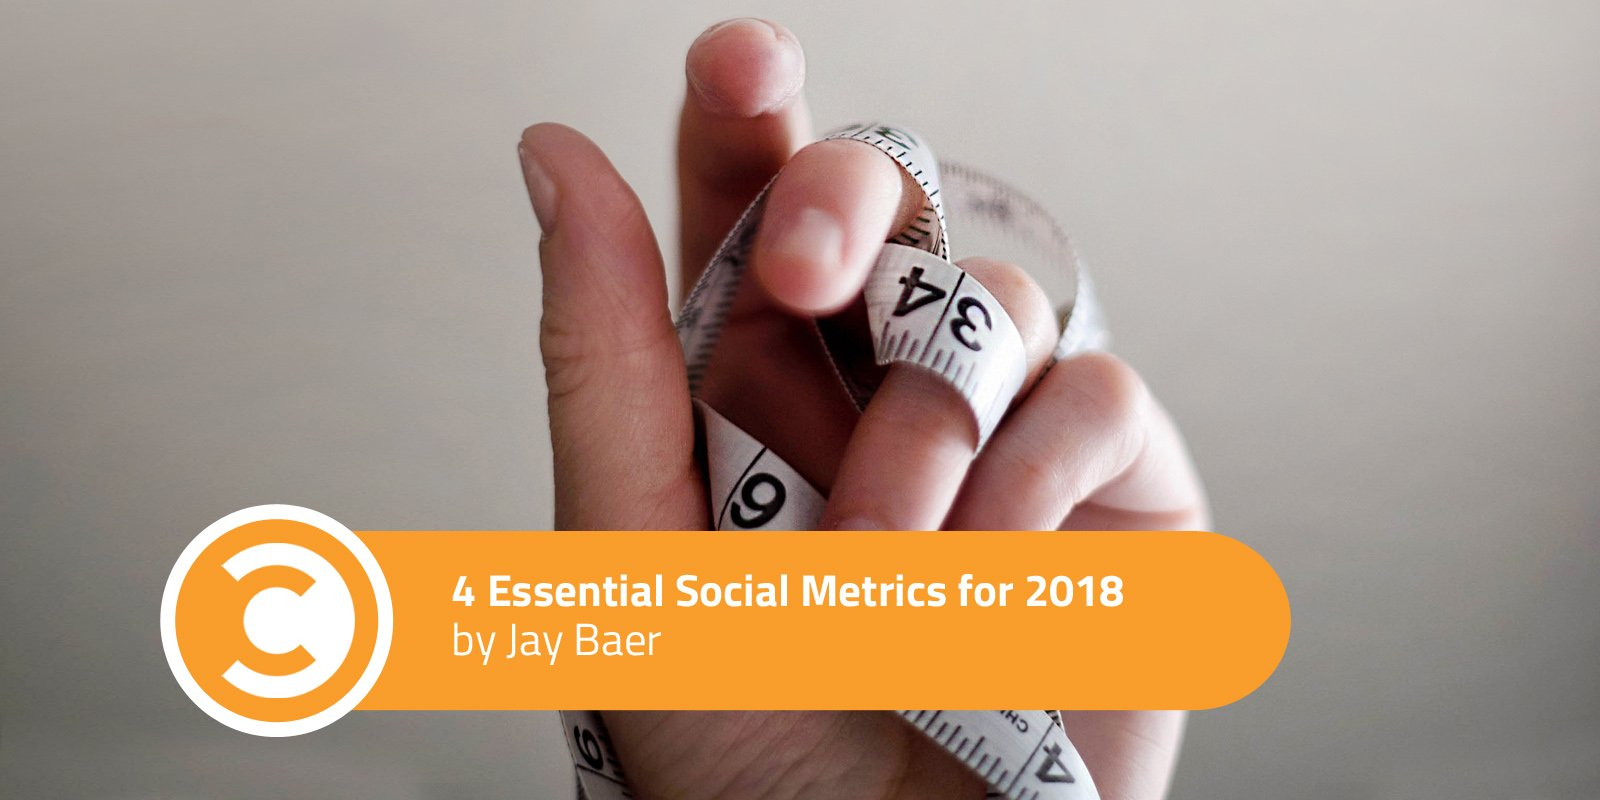 4 Essential Social Metrics for 2018